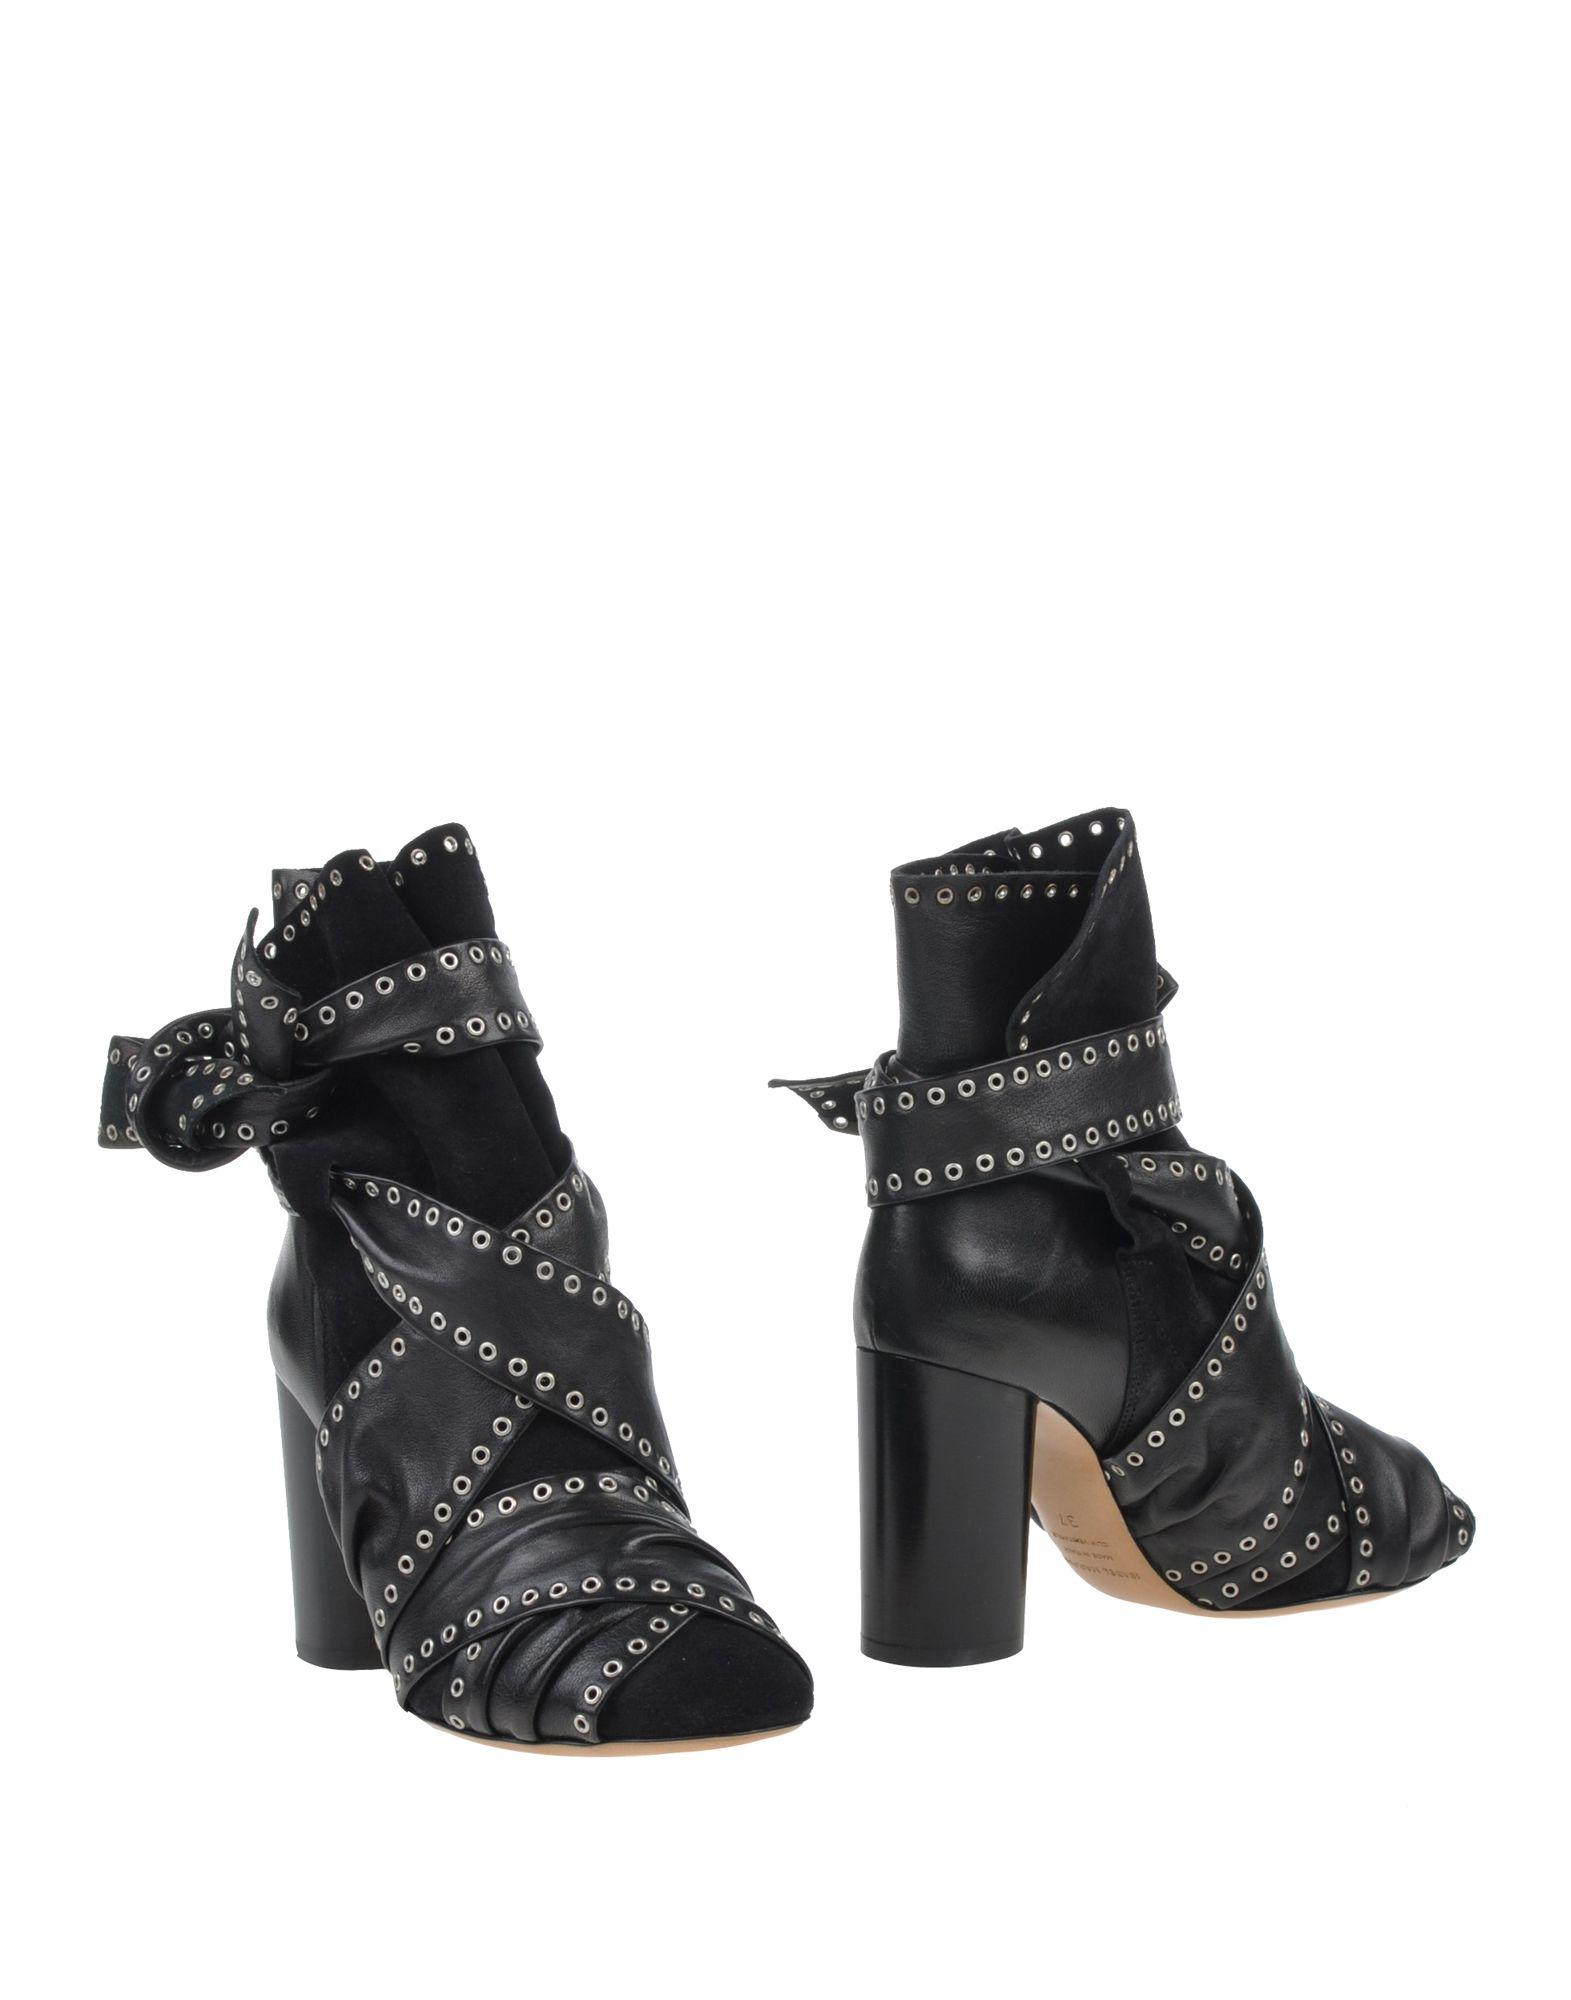 Isabel Marant Leather Wrap-Around Ankle Boots big sale online 57Nj2RXKh